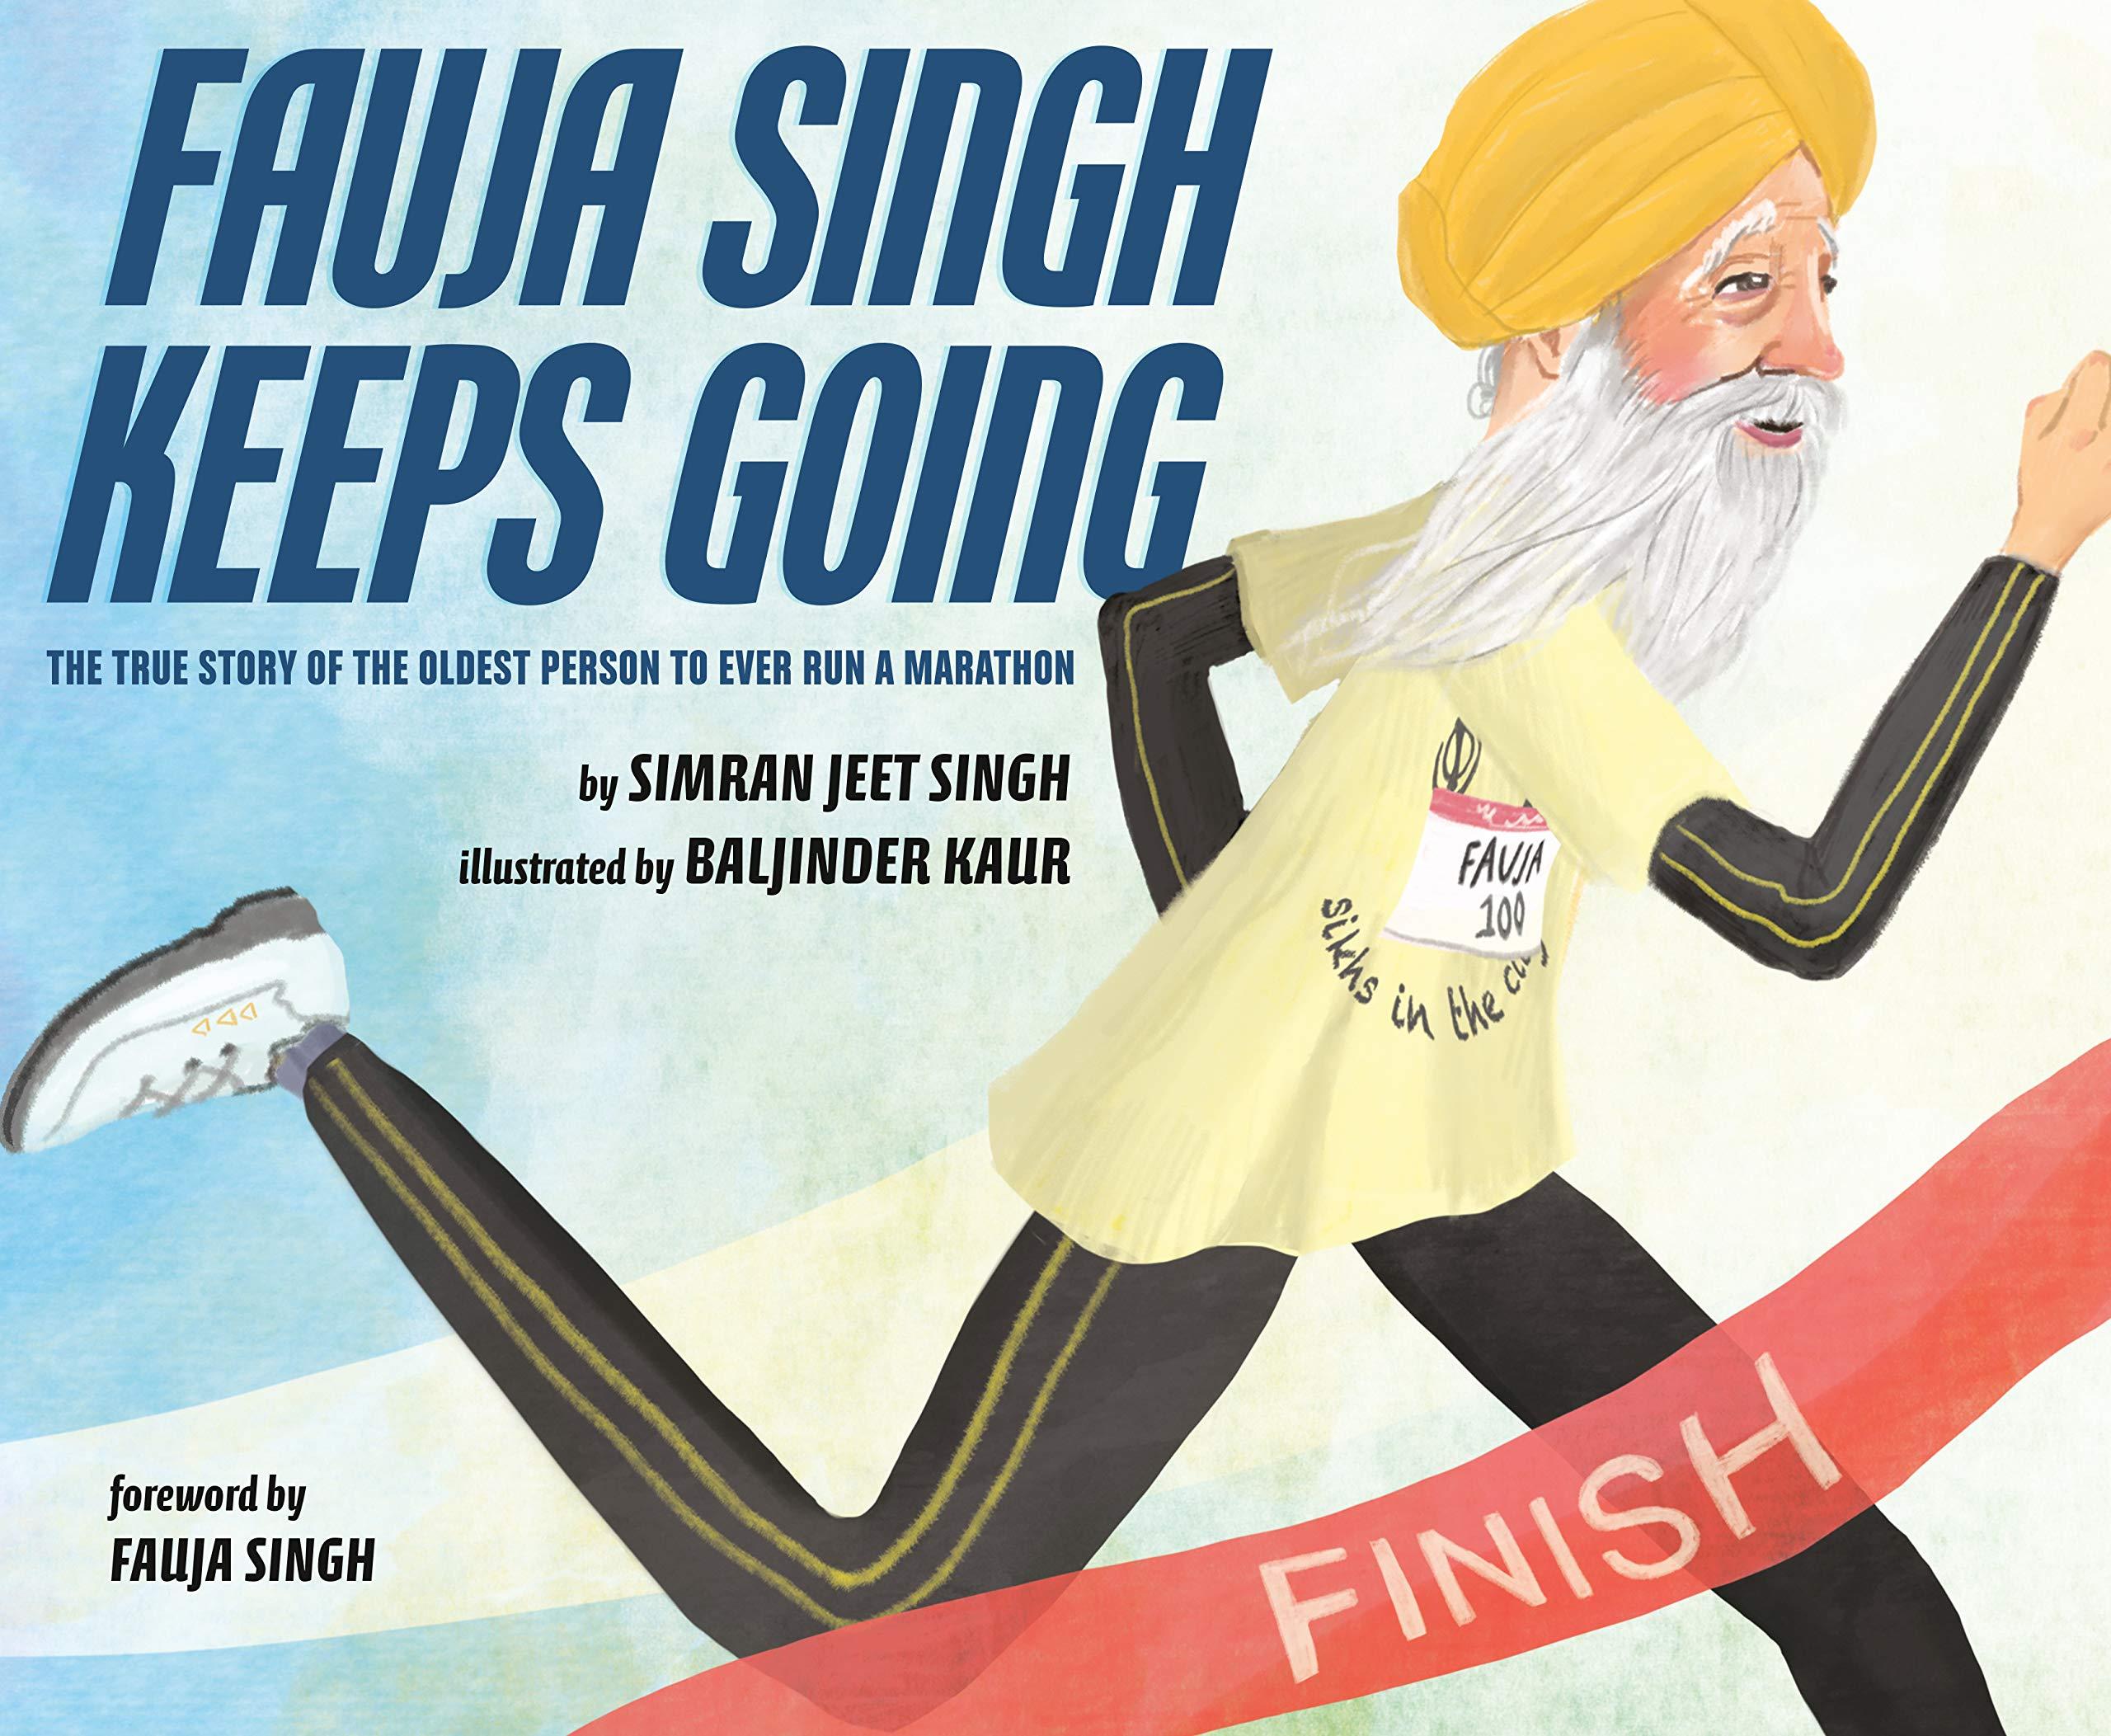 Fauja Singh Keeps Going: The True Story of the Oldest Person to Ever Run a  Marathon: Singh, Simran Jeet, Kaur, Baljinder: 9780525555094: Amazon.com:  Books